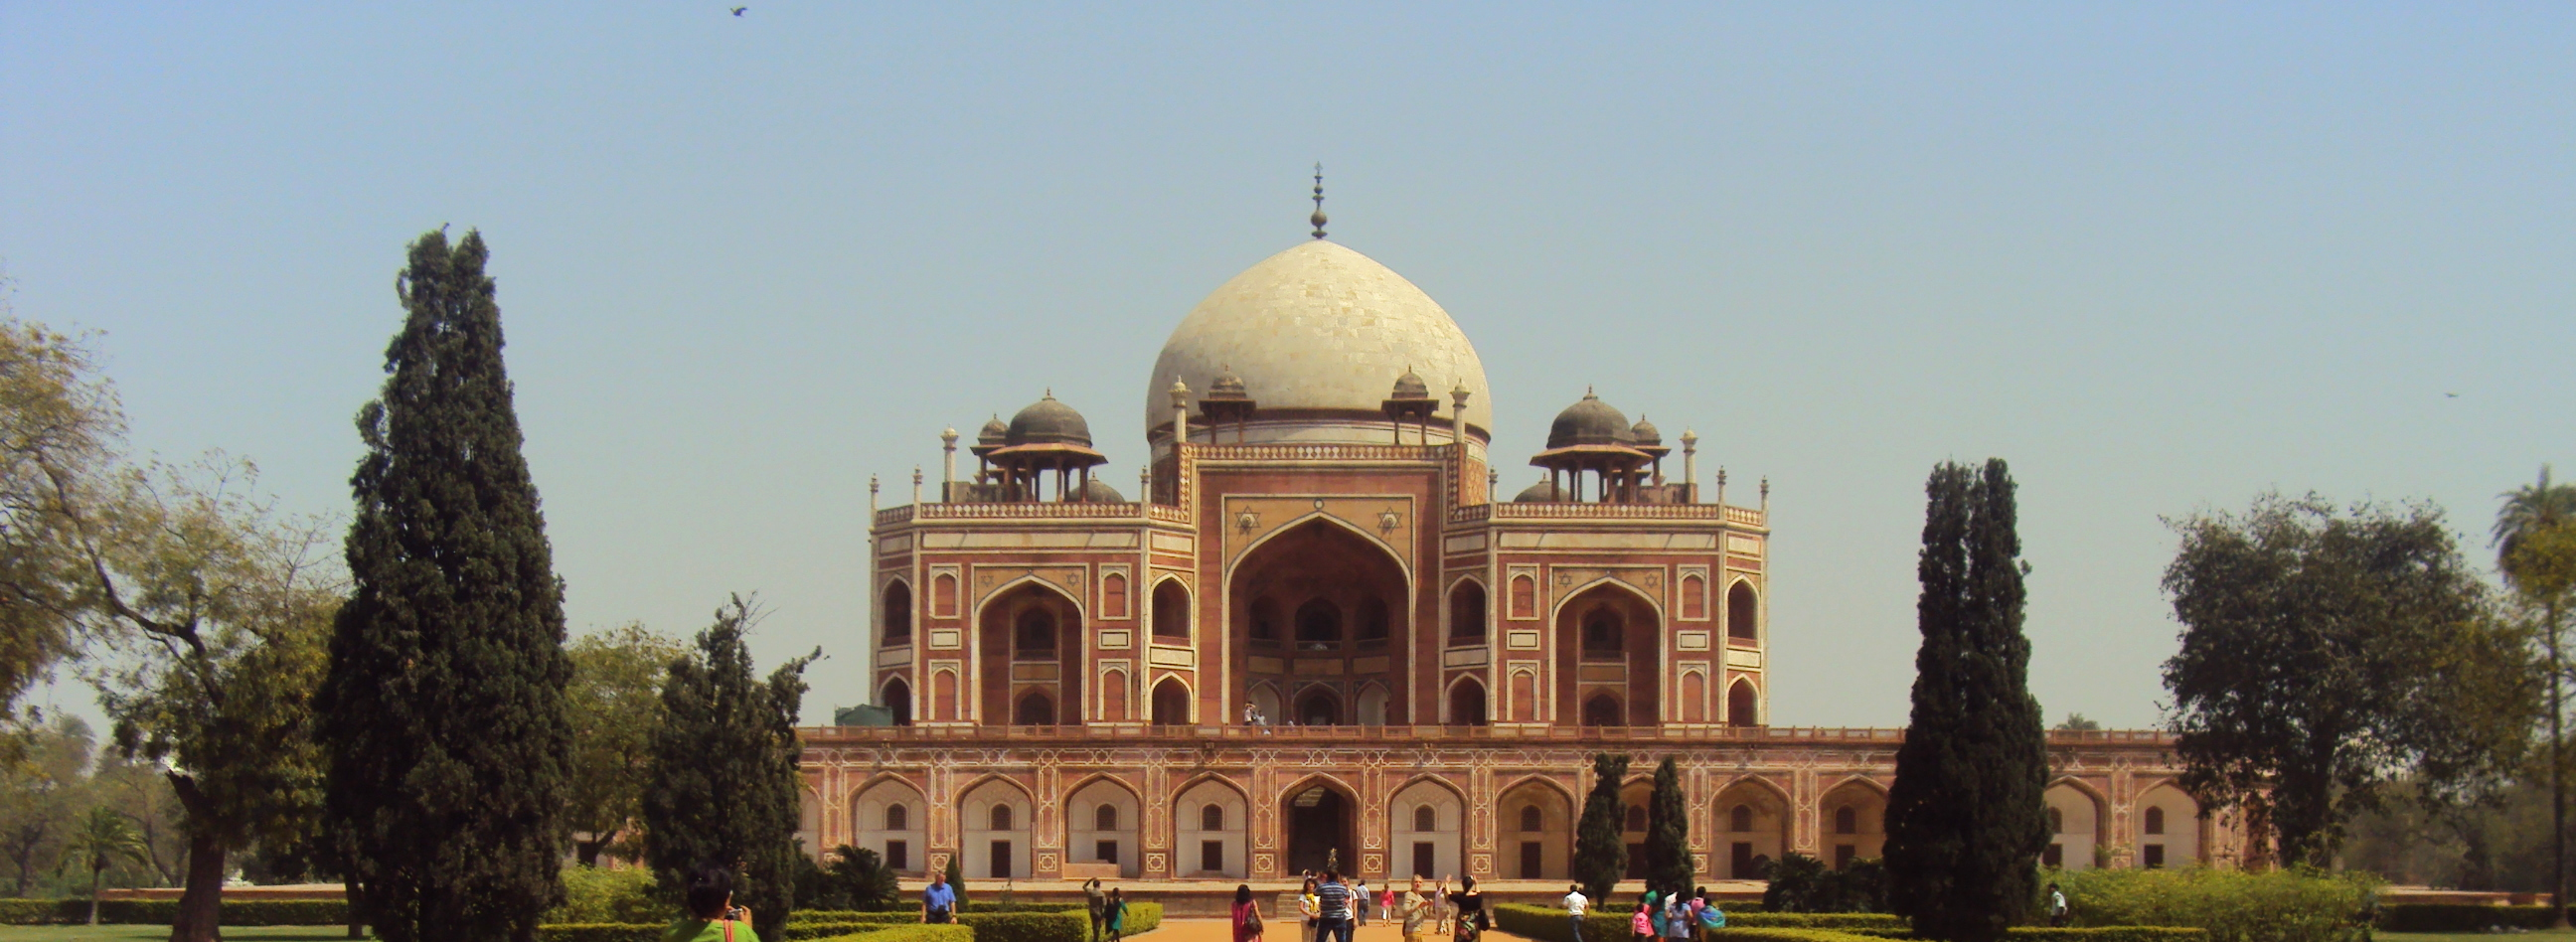 The Beauty of Death Humayun's Tomb, Delhi - India Aakriti Suresh